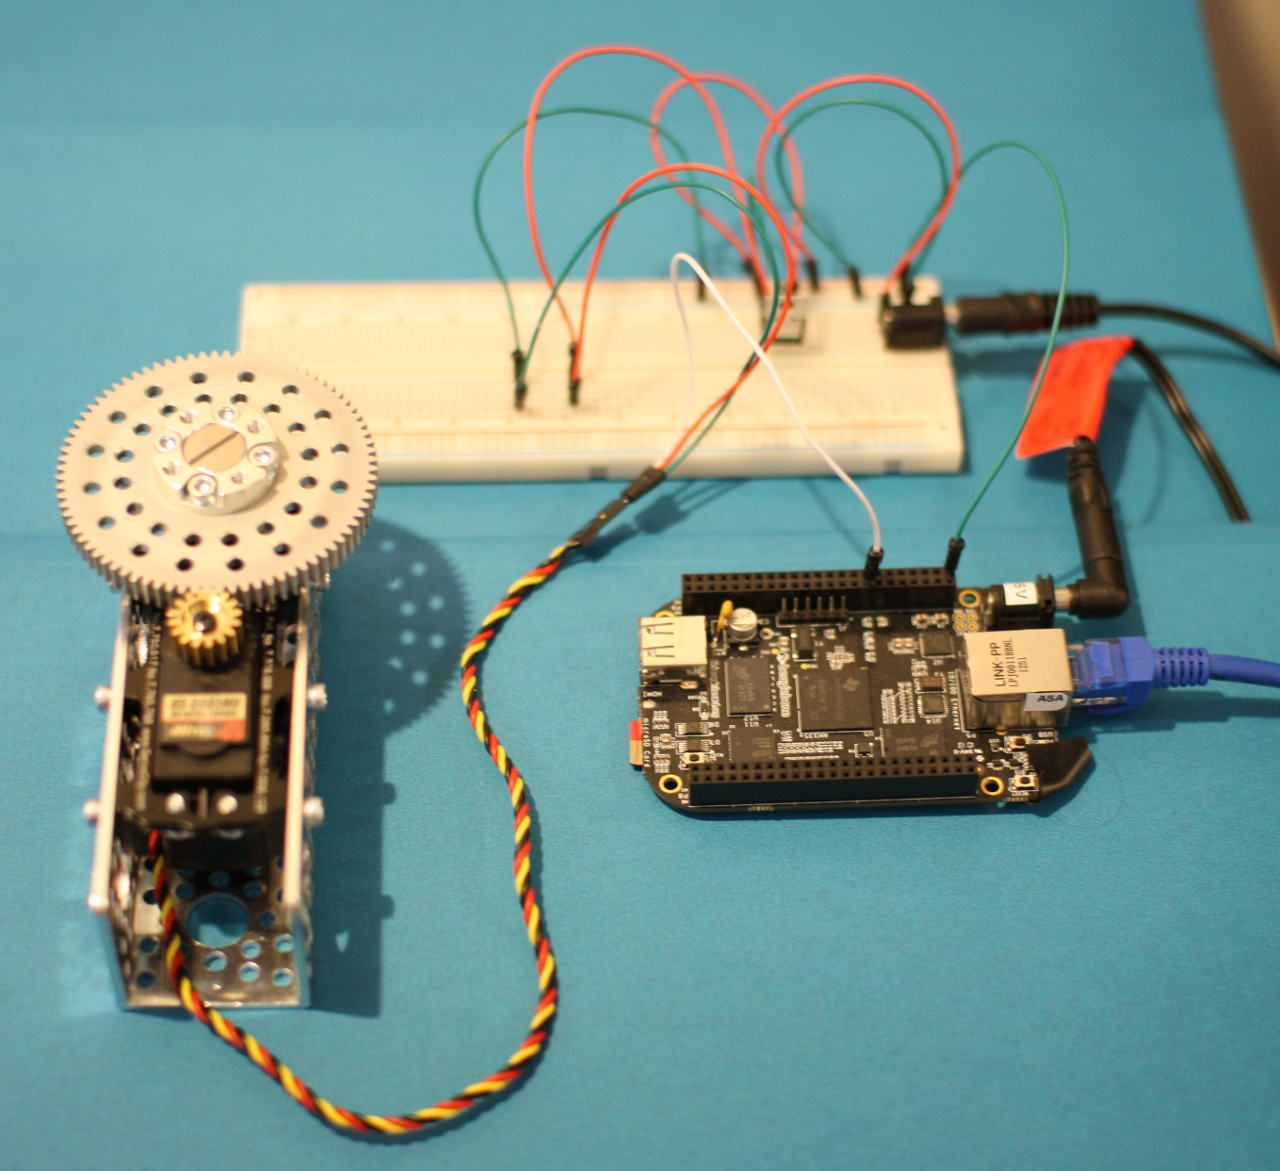 A Servo Motor Connected To A Beaglebone Black Running Linux Beaglebone Black Black Beagle Linux